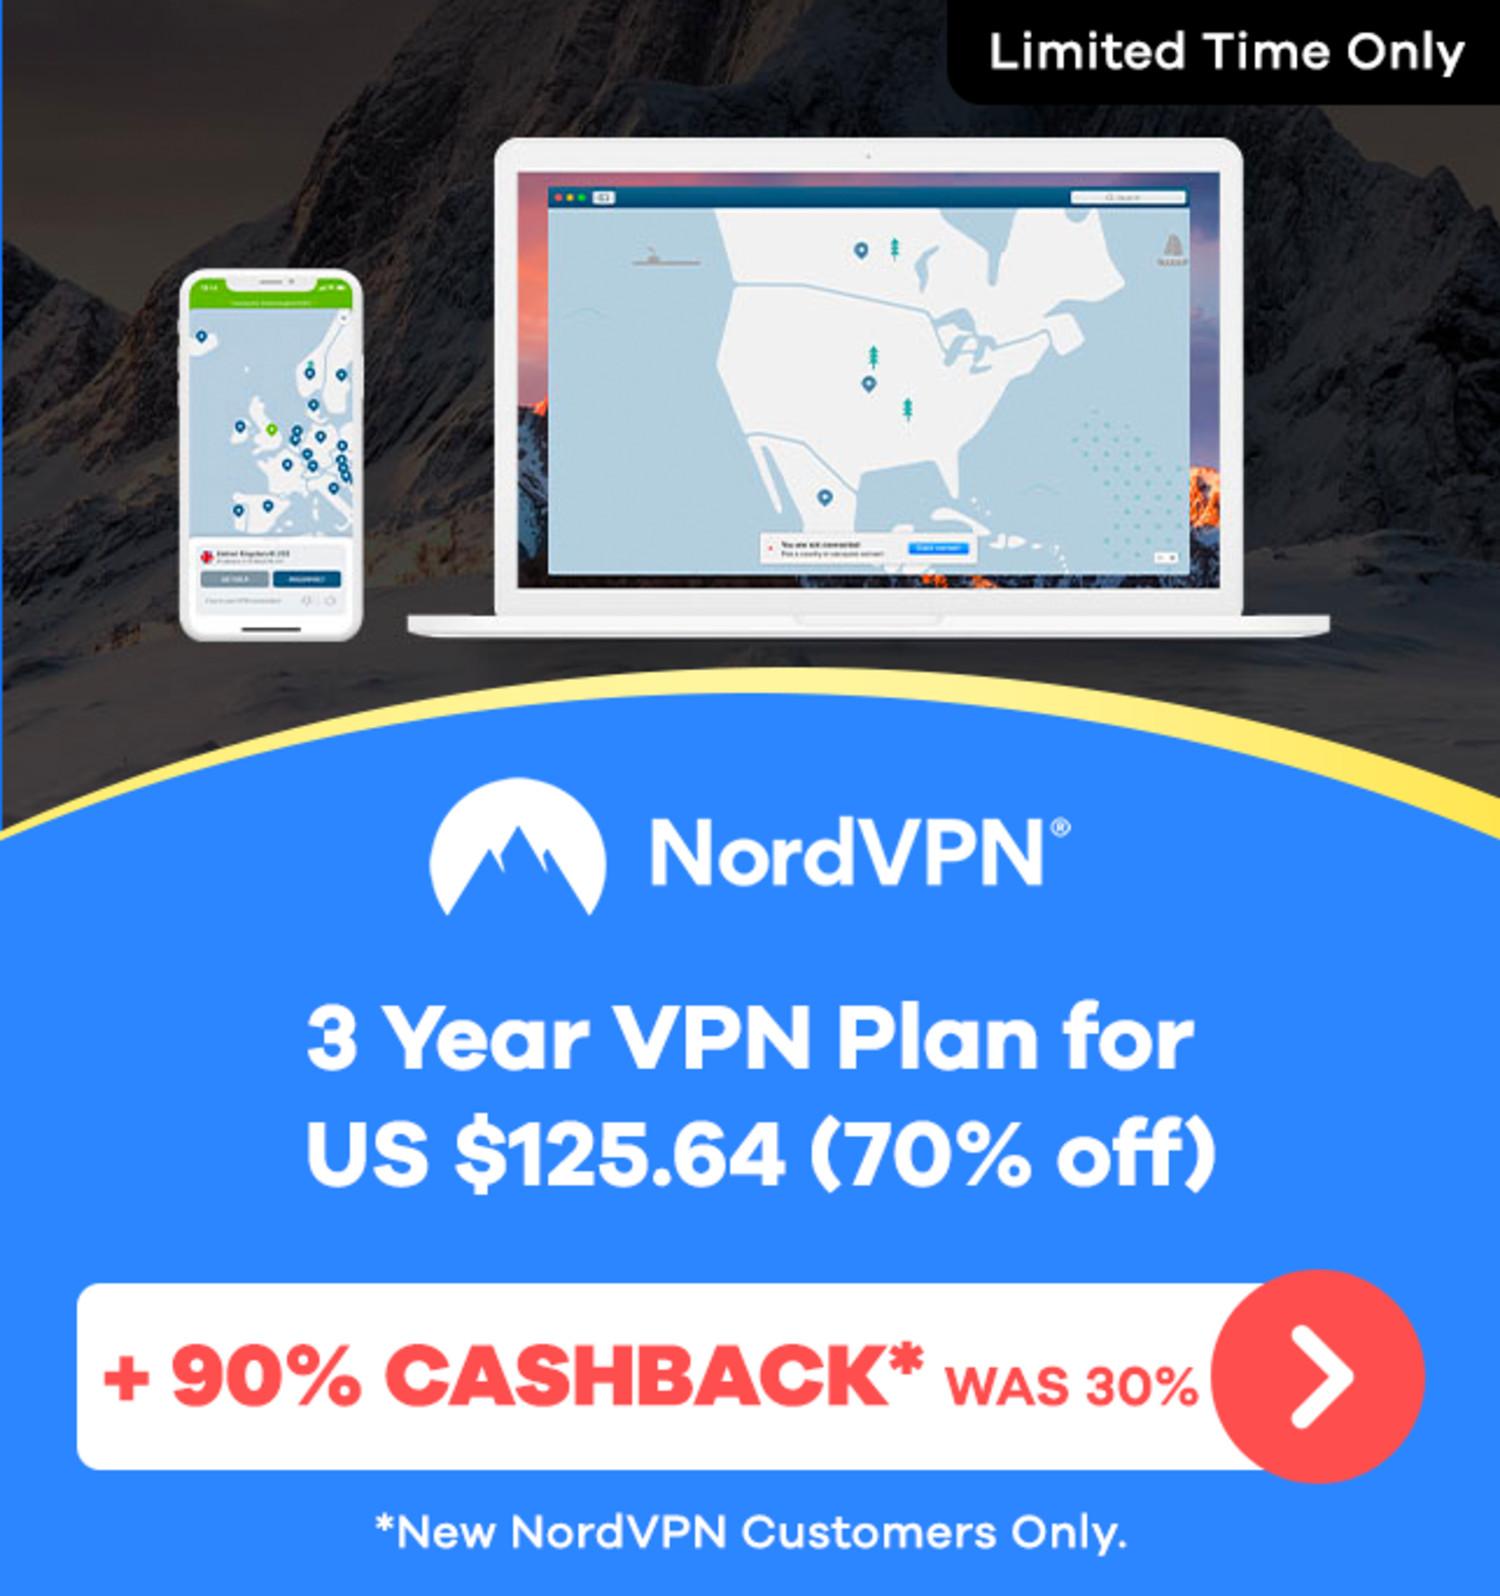 NordVPN - 90% Upsized Cashback